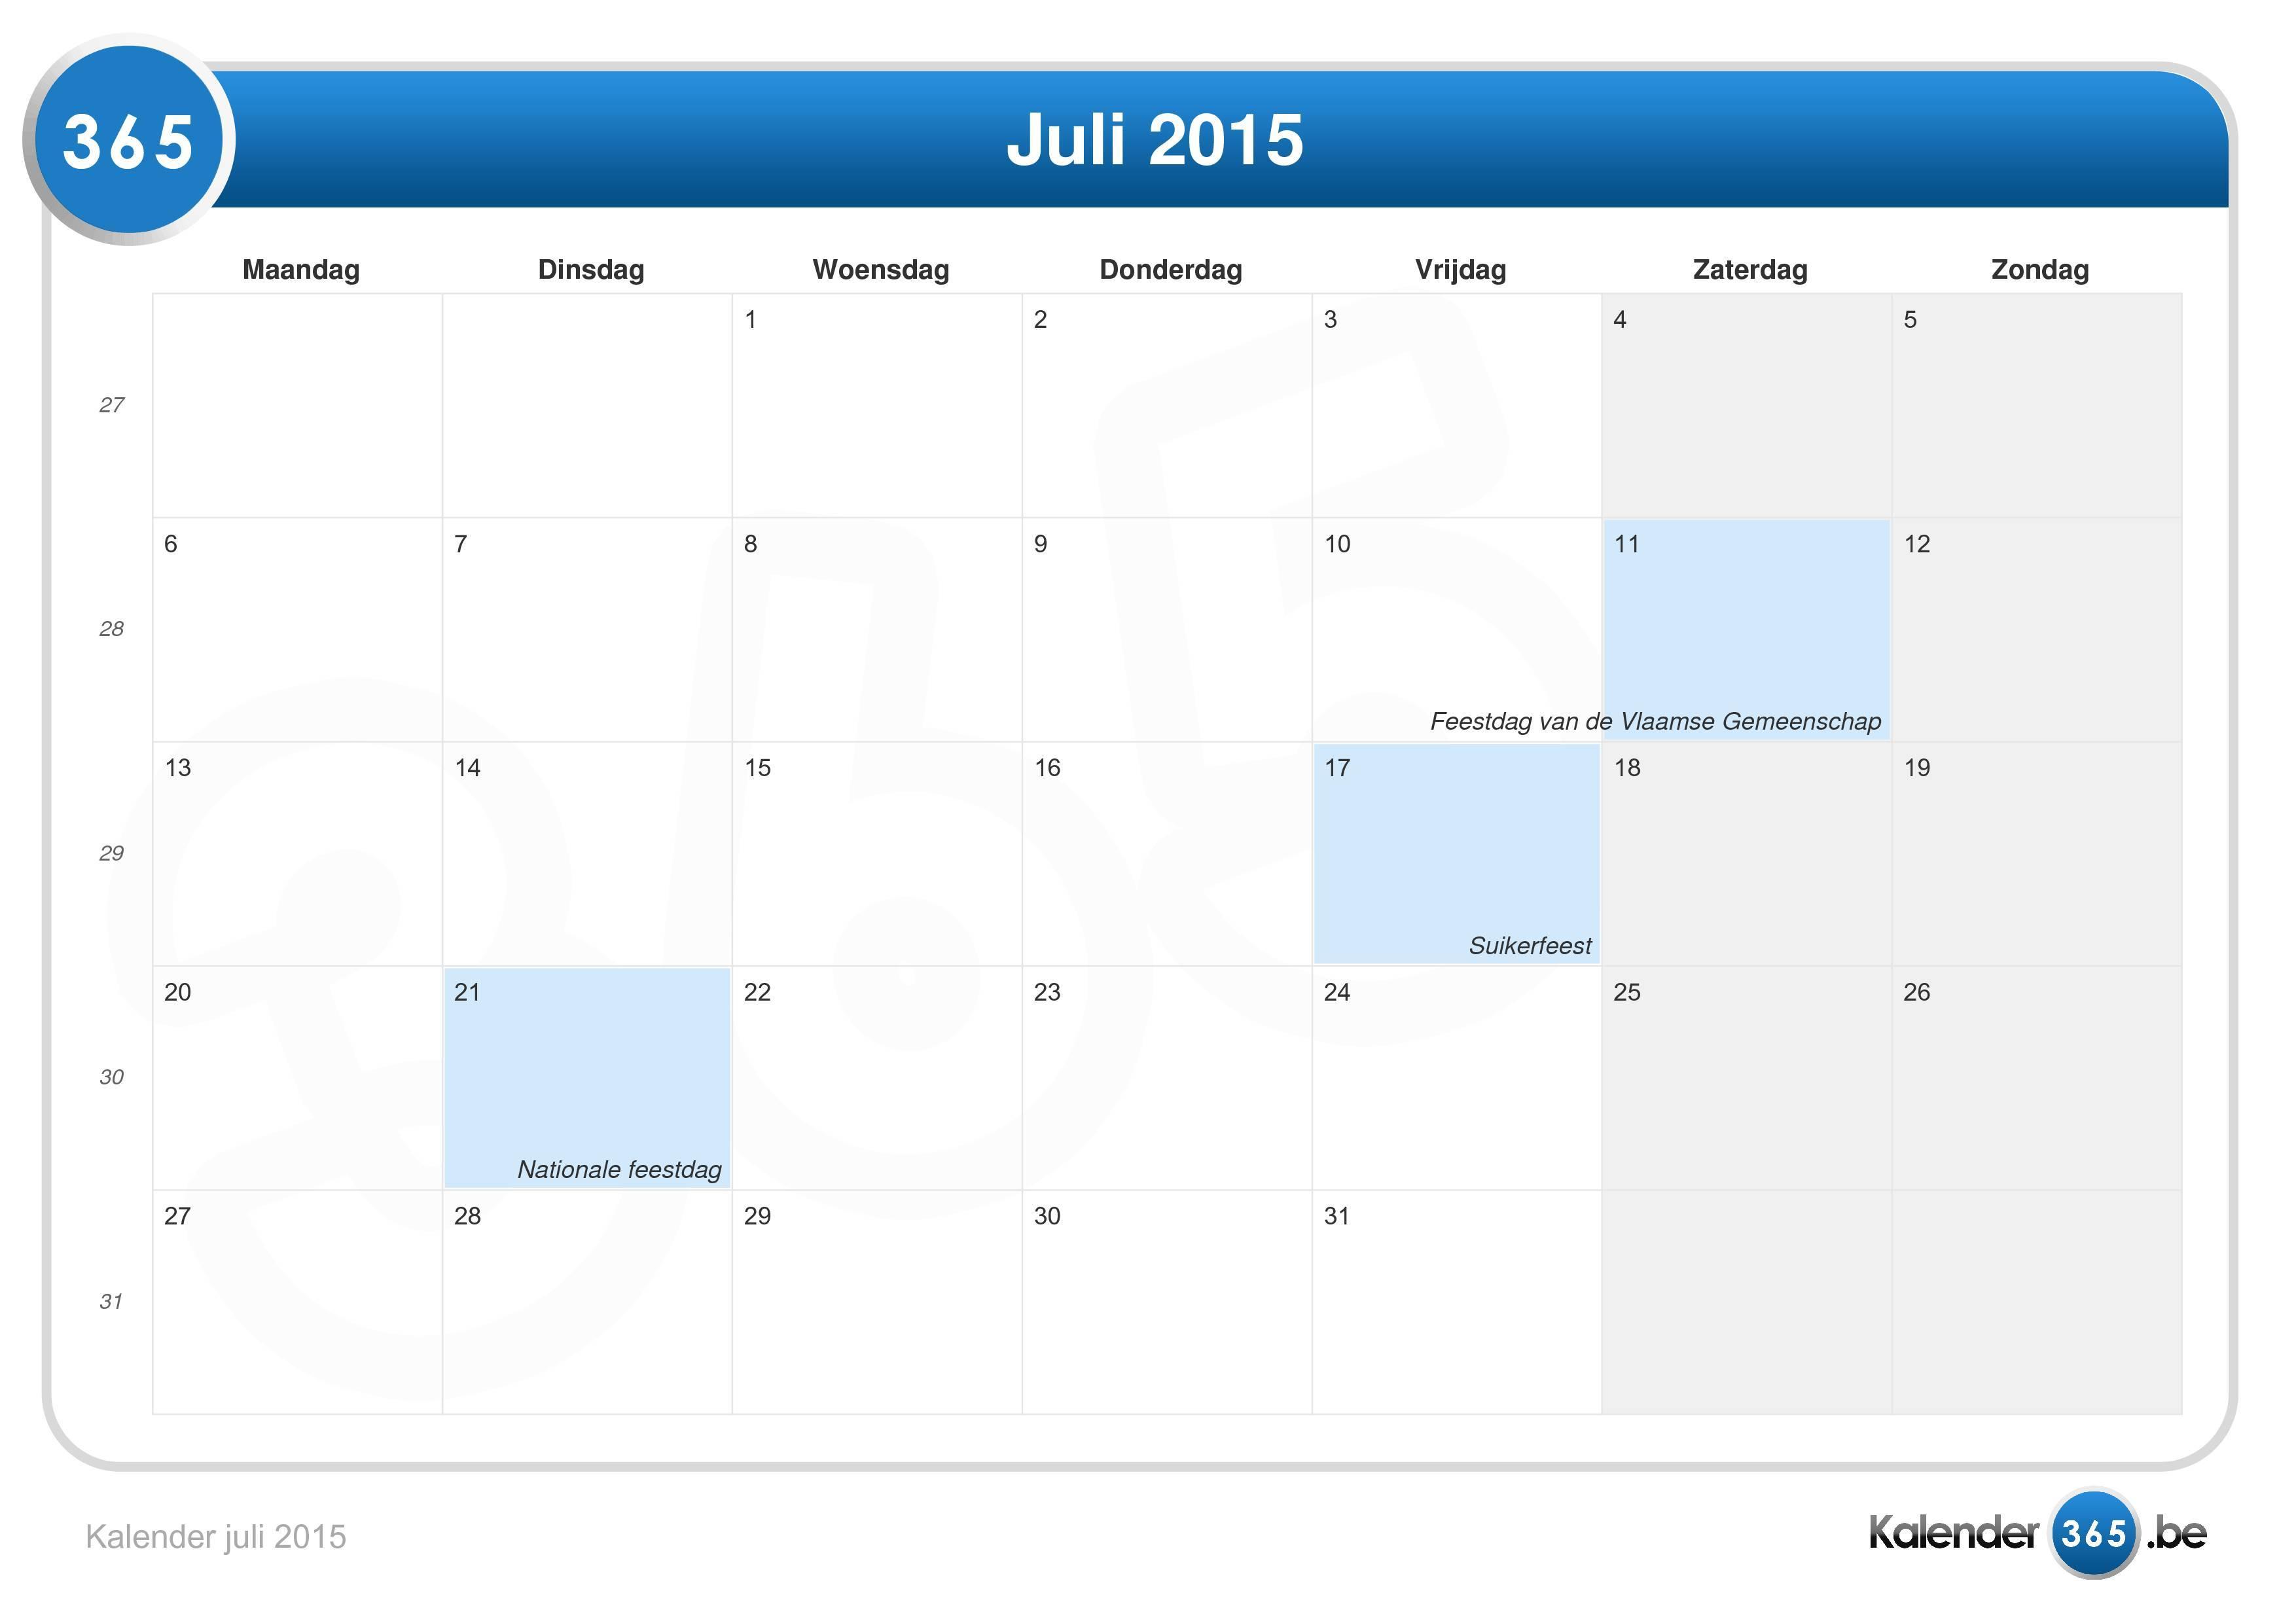 Kalender juli 2015